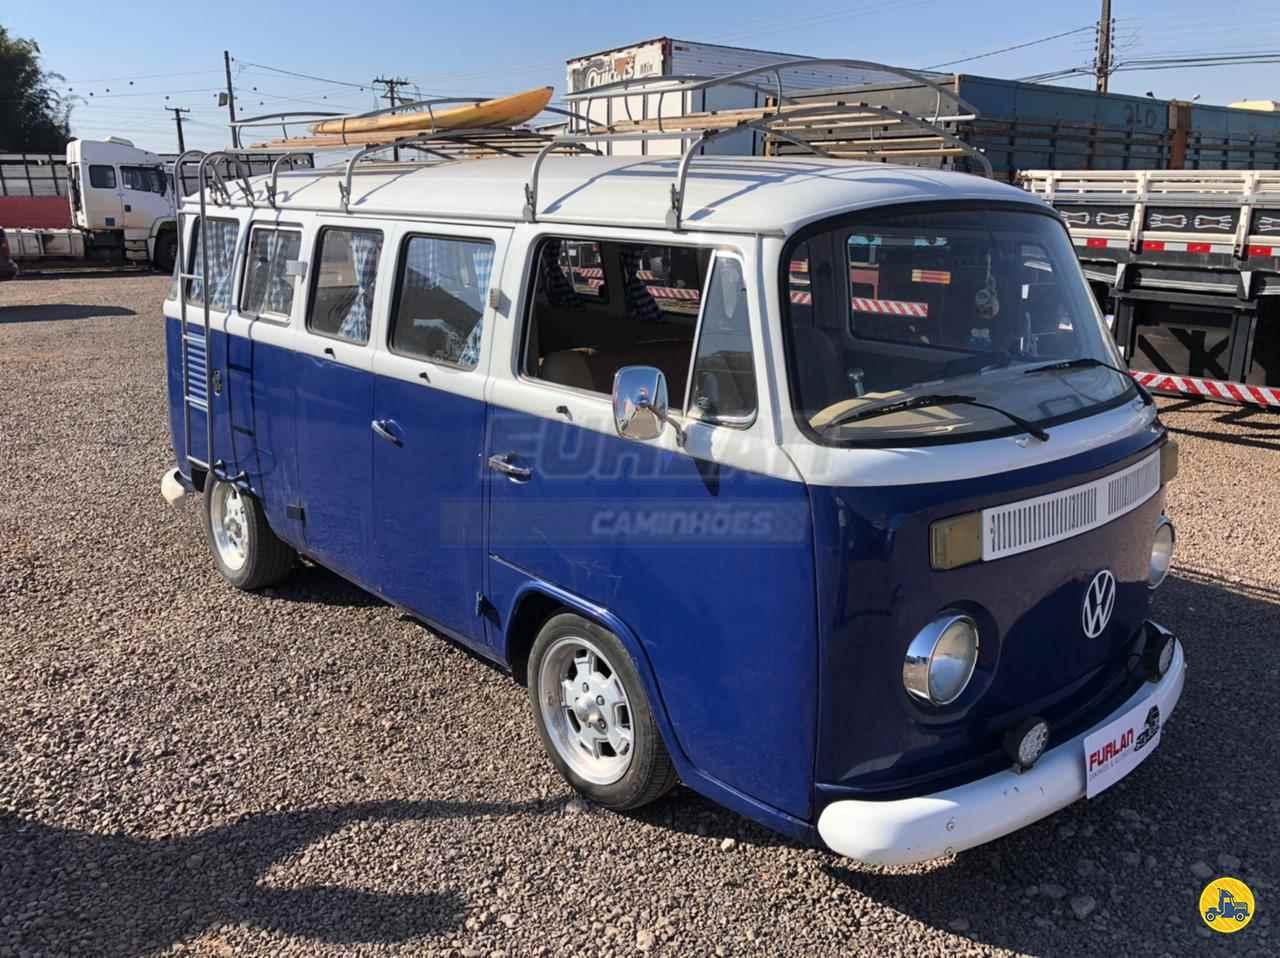 UTILITARIOS VW - Volkswagen Kombi Pick UP Furlan Caminhões UMUARAMA PARANÁ PR